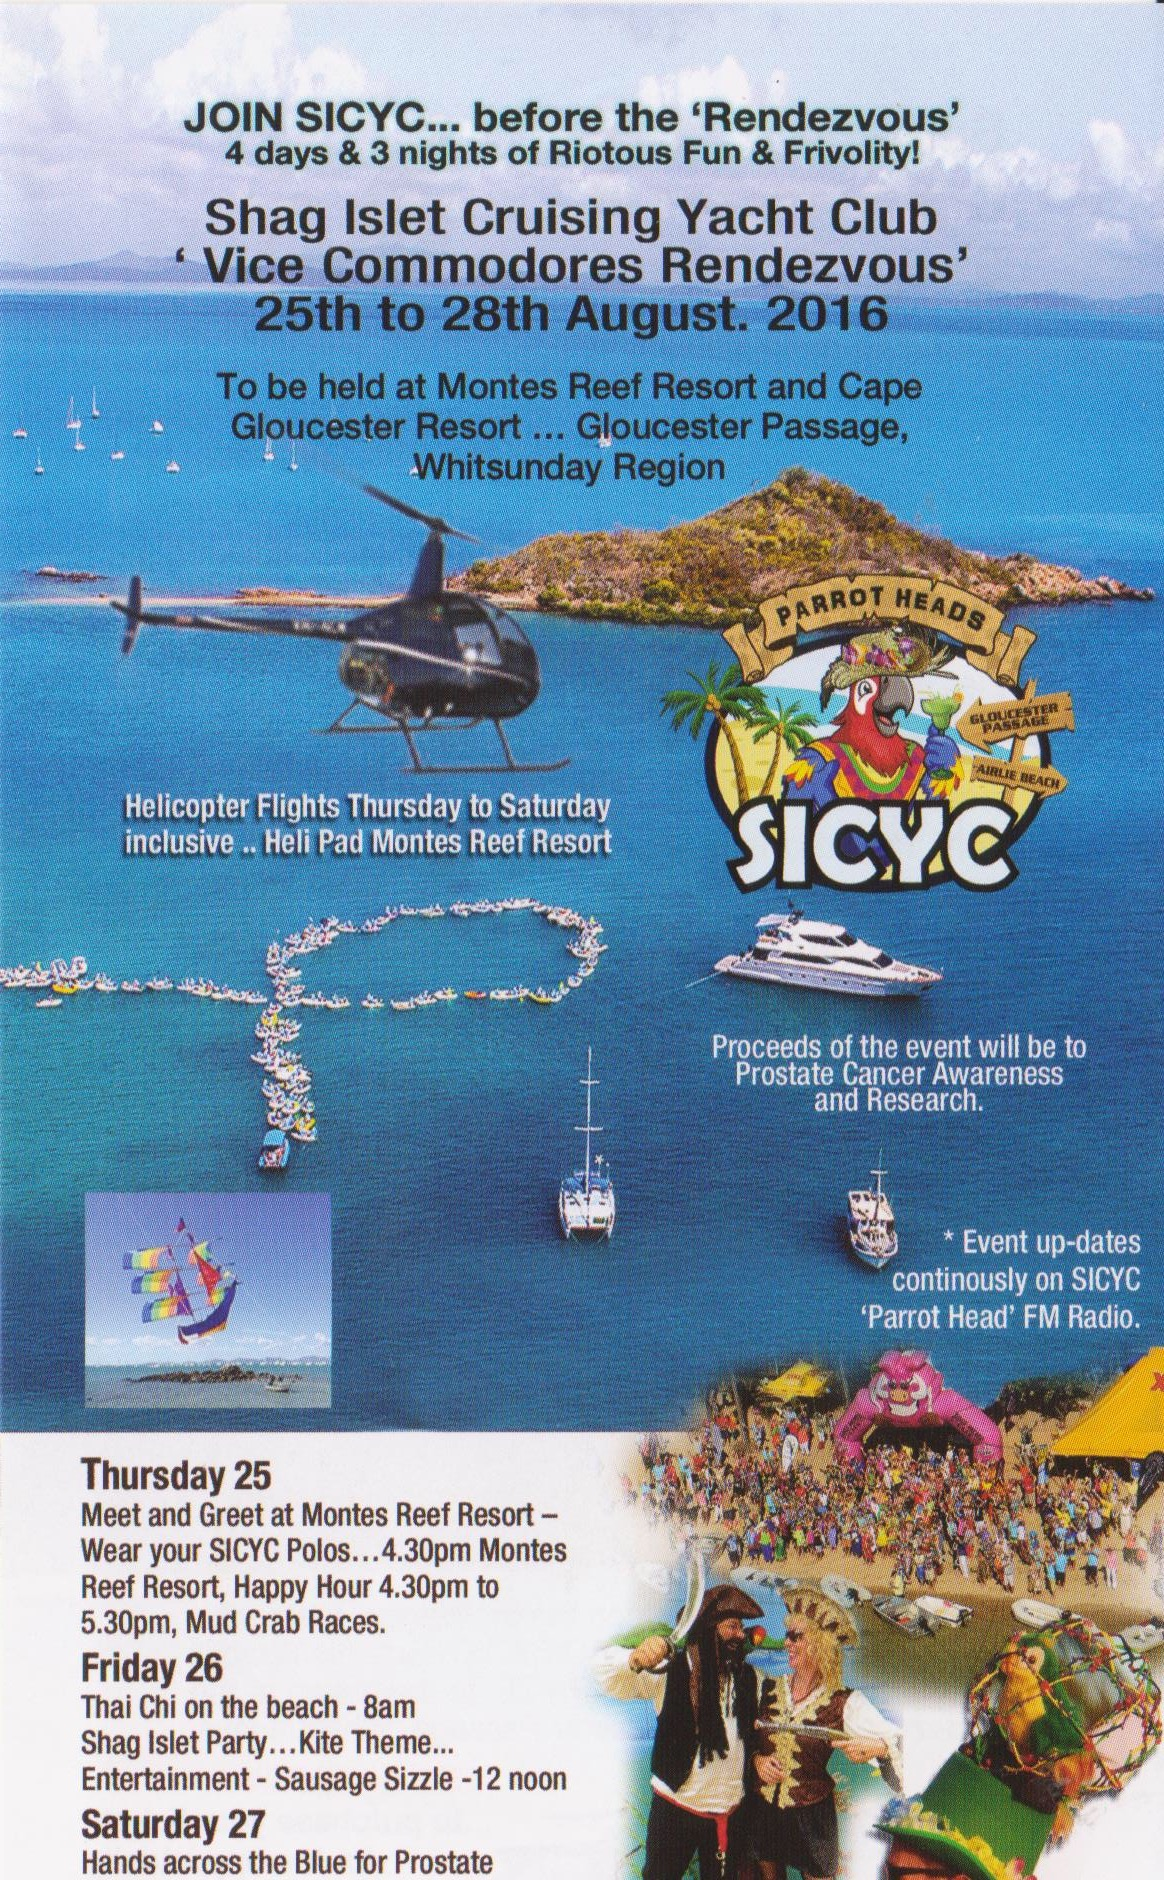 SICYC Vice Commodores Rendezvous 2016